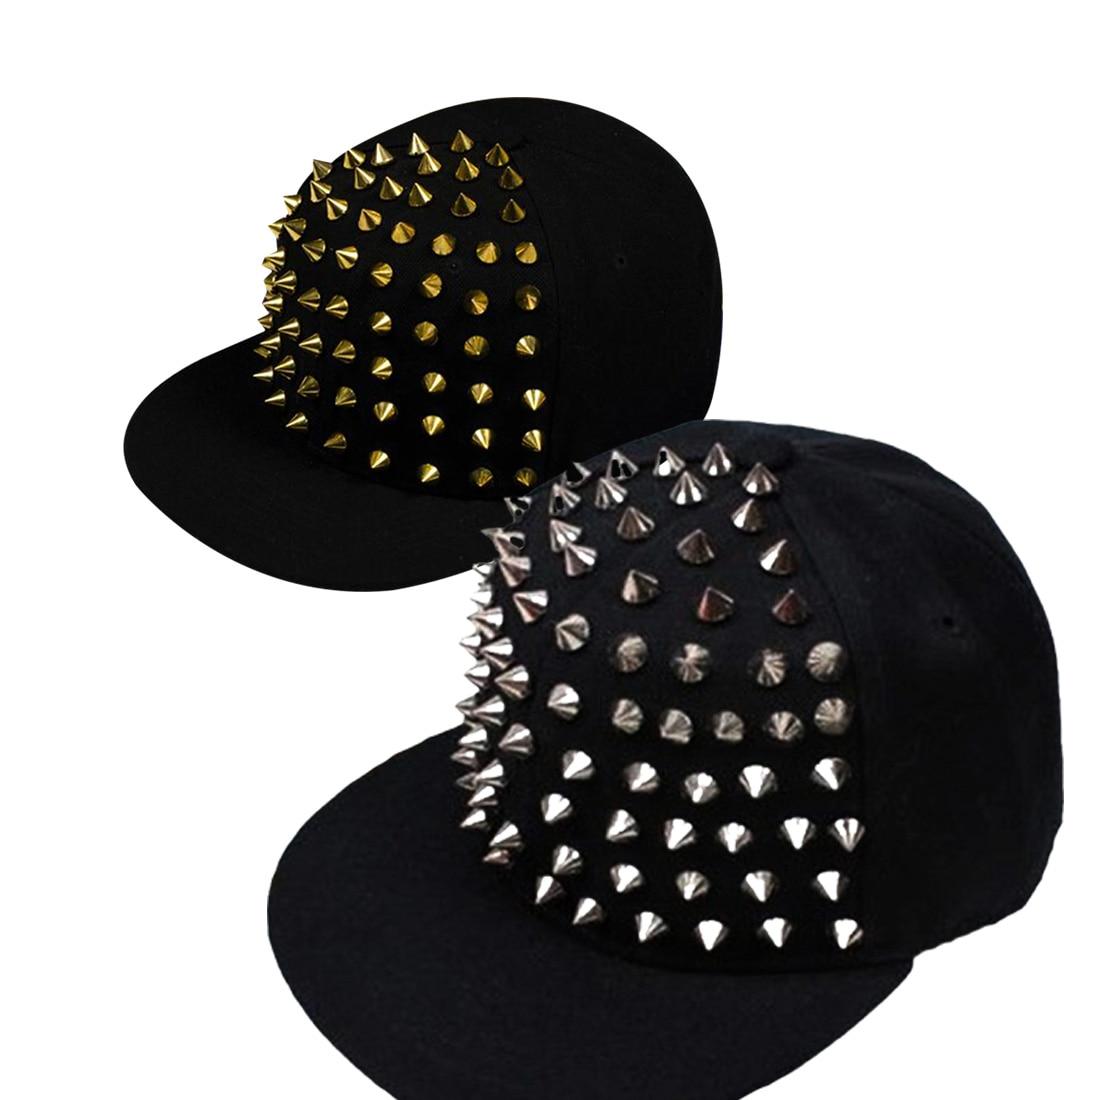 Snapback Cap Unisex Punk Rock Hip Hop Silver Rivet Stud Spike Spiky Hat Adjustable Adult Cap Women&Men Baseball Cap